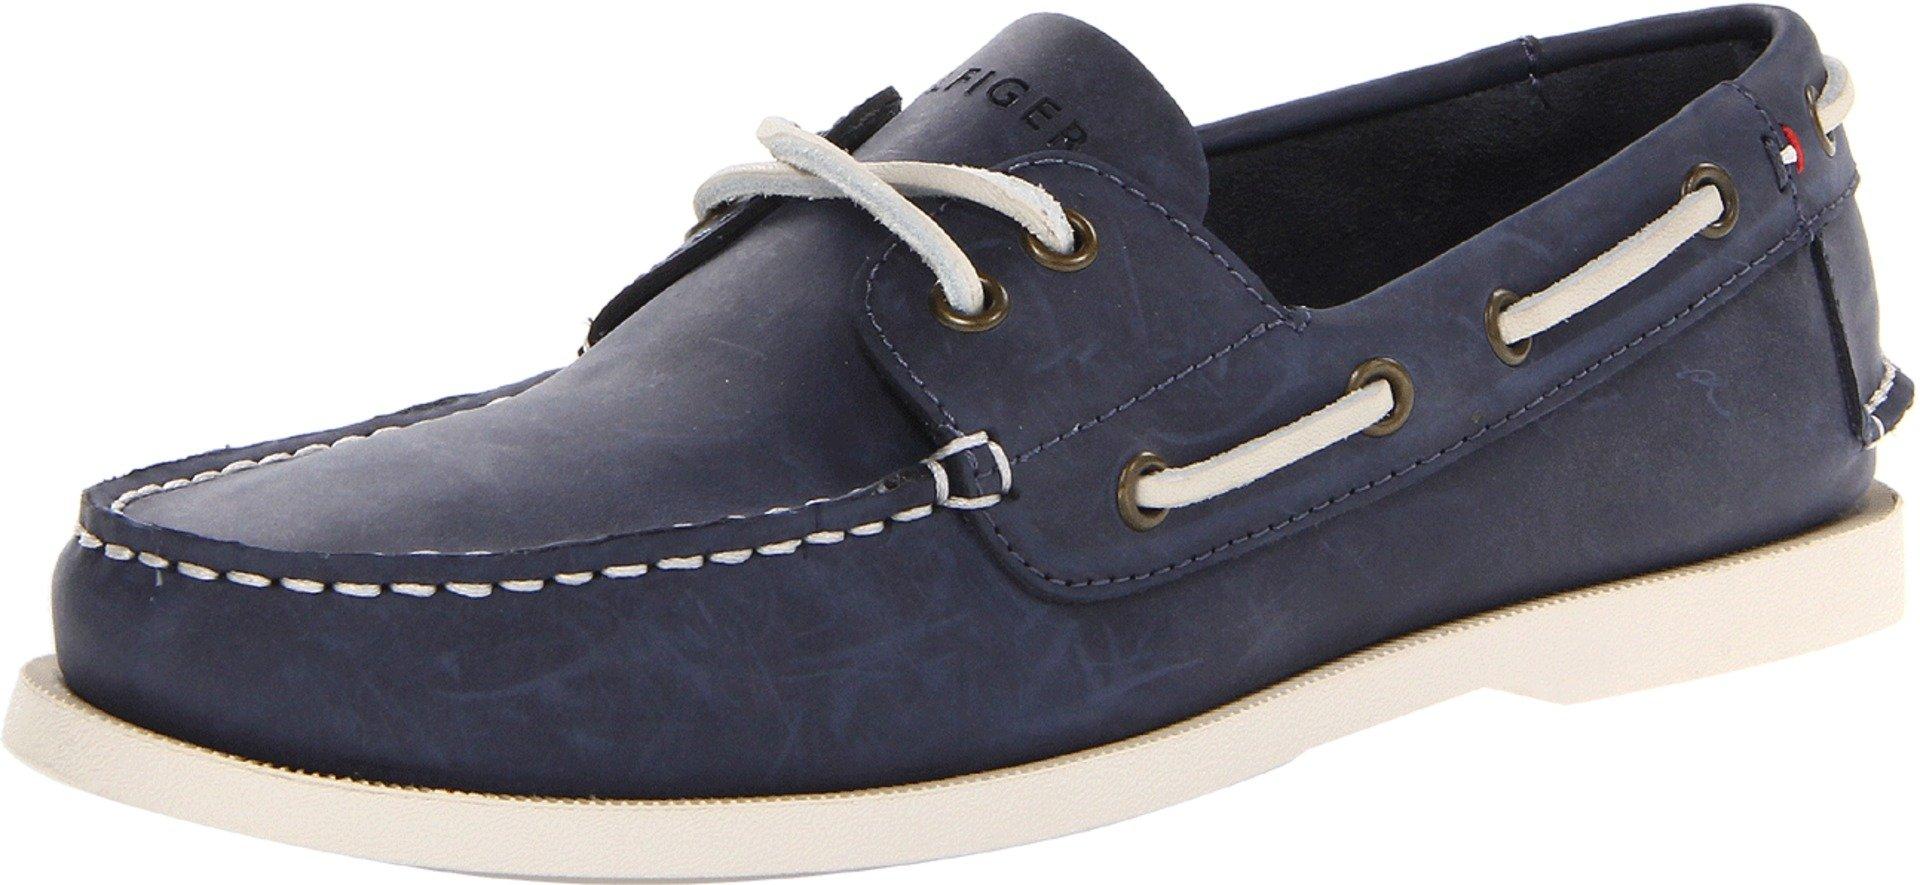 Tommy Hilfiger Men's Bowman Boat shoe, Navy, 10.5 M US